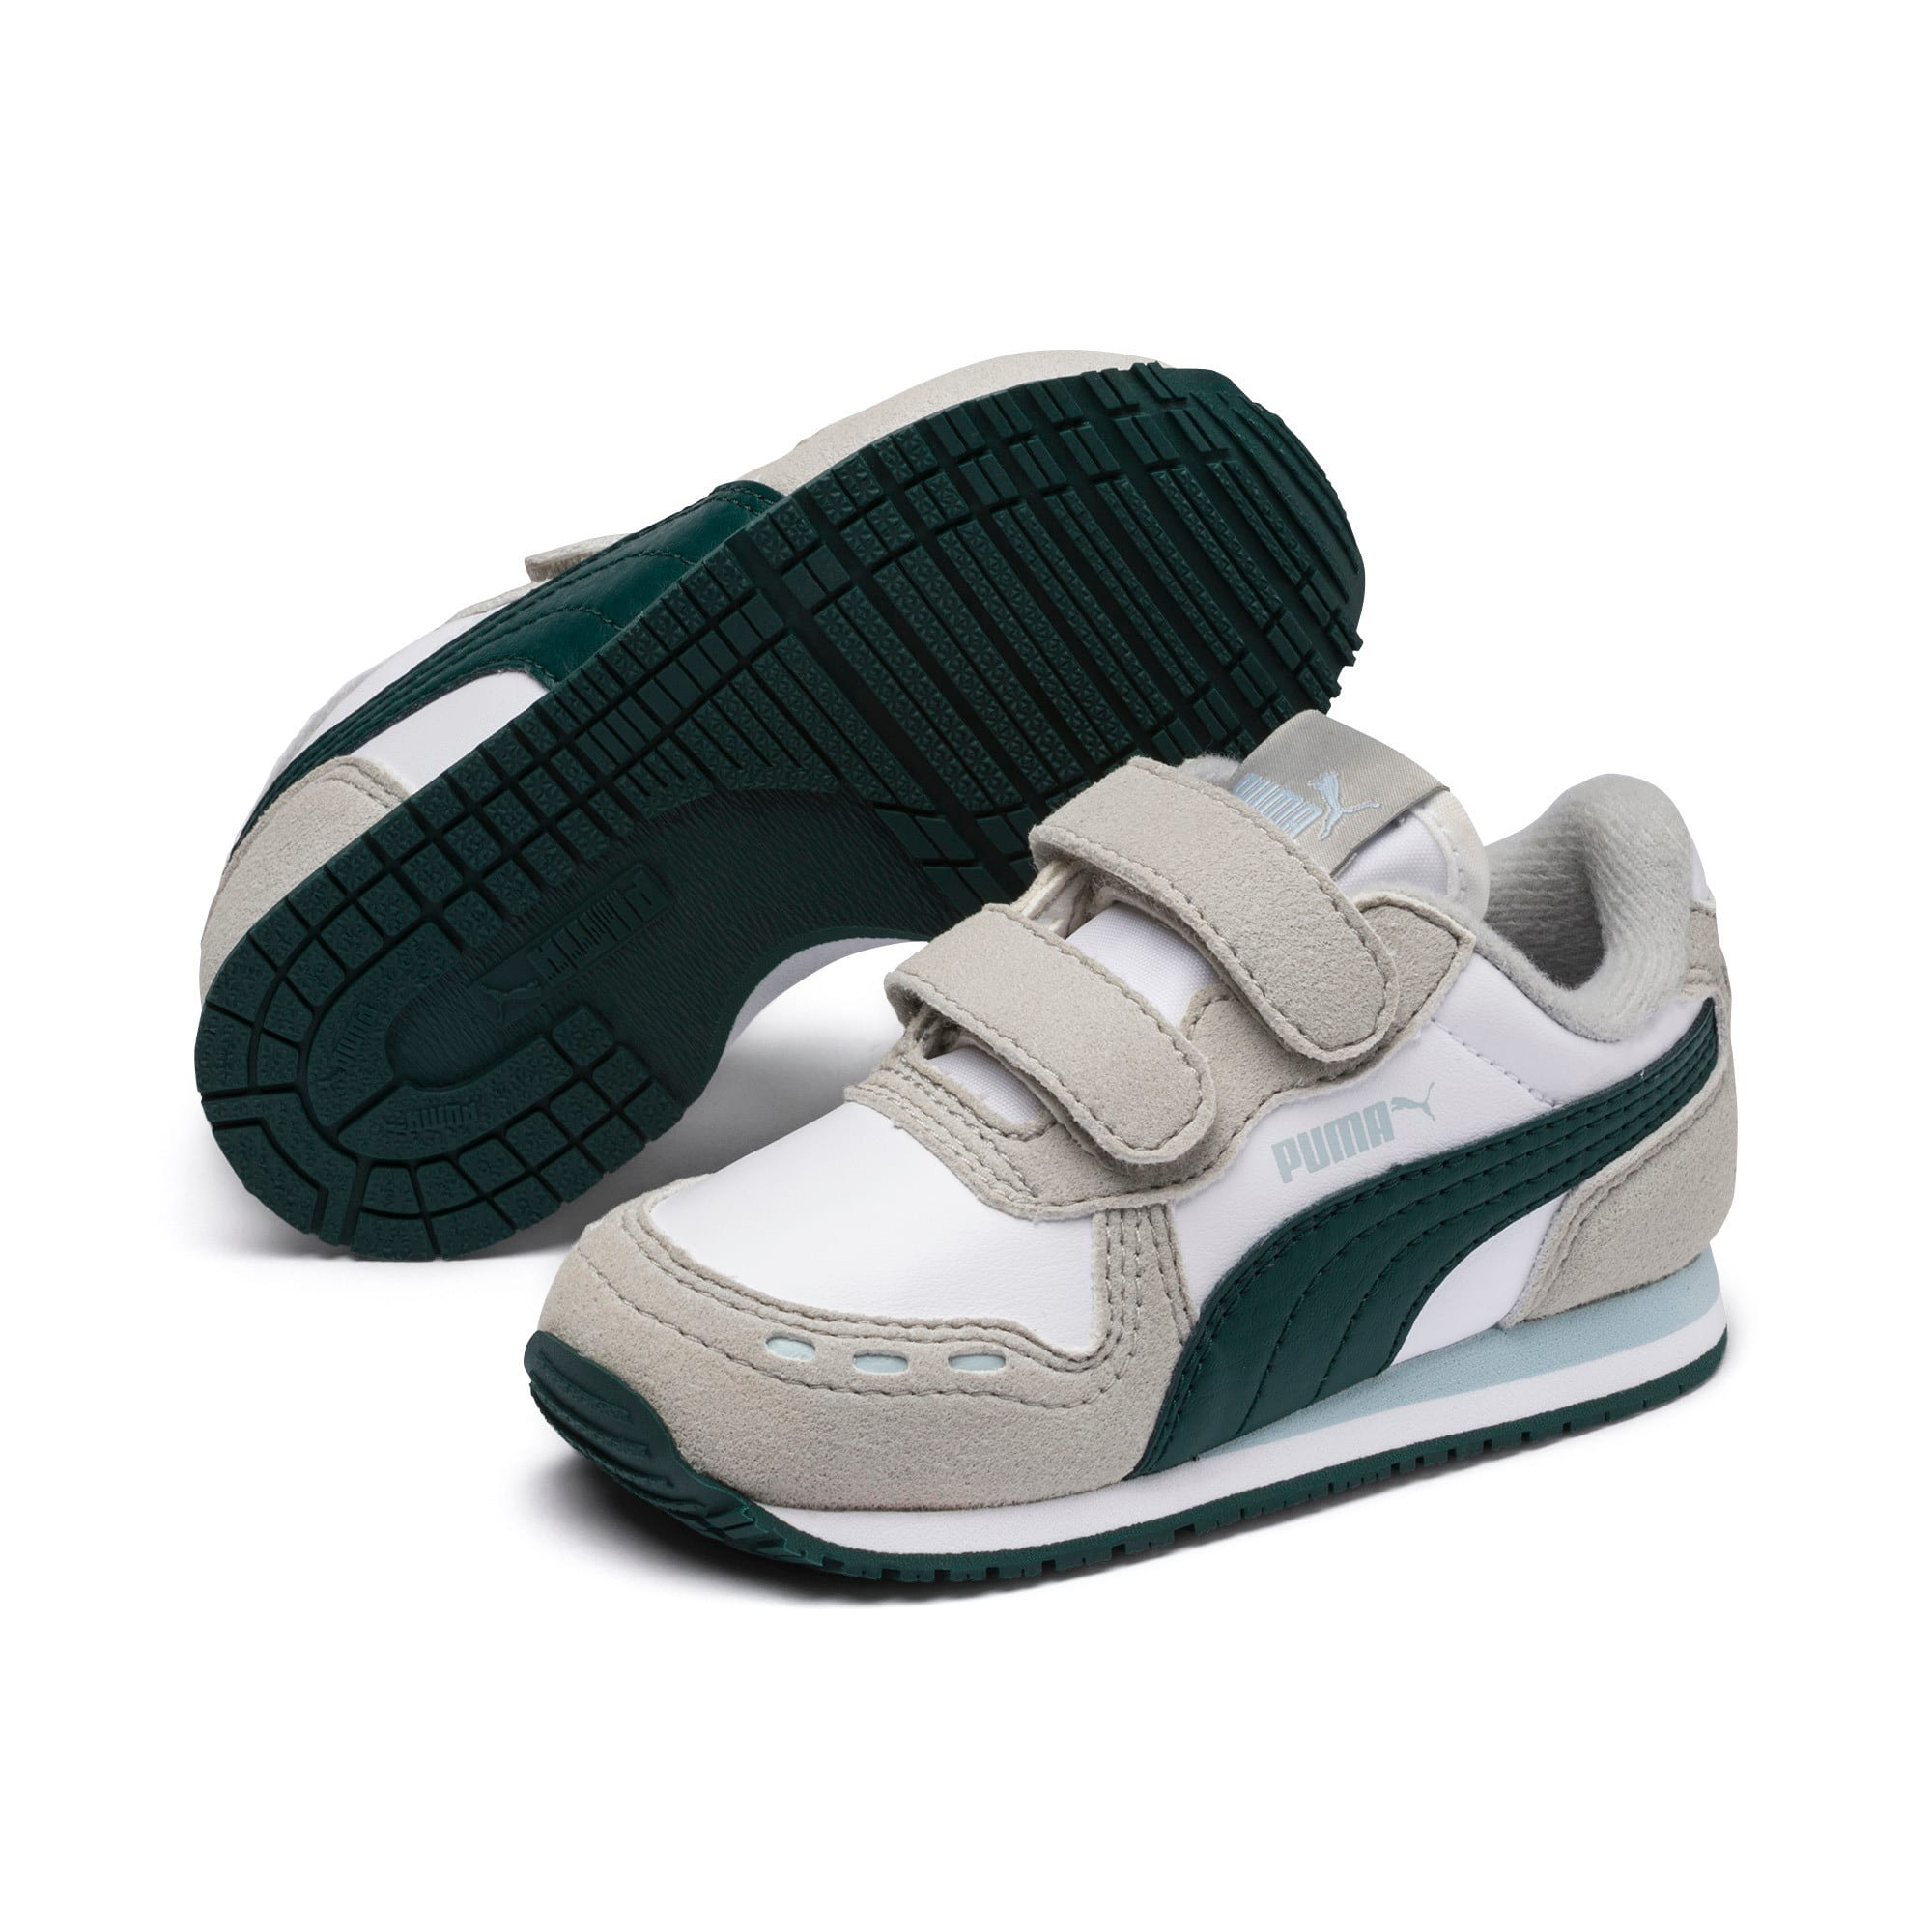 Thumbnail 2 of Cabana Racer SL AC Little Kids' Shoes, P.Wht-Gr.Violet-Ponder. Pine, medium